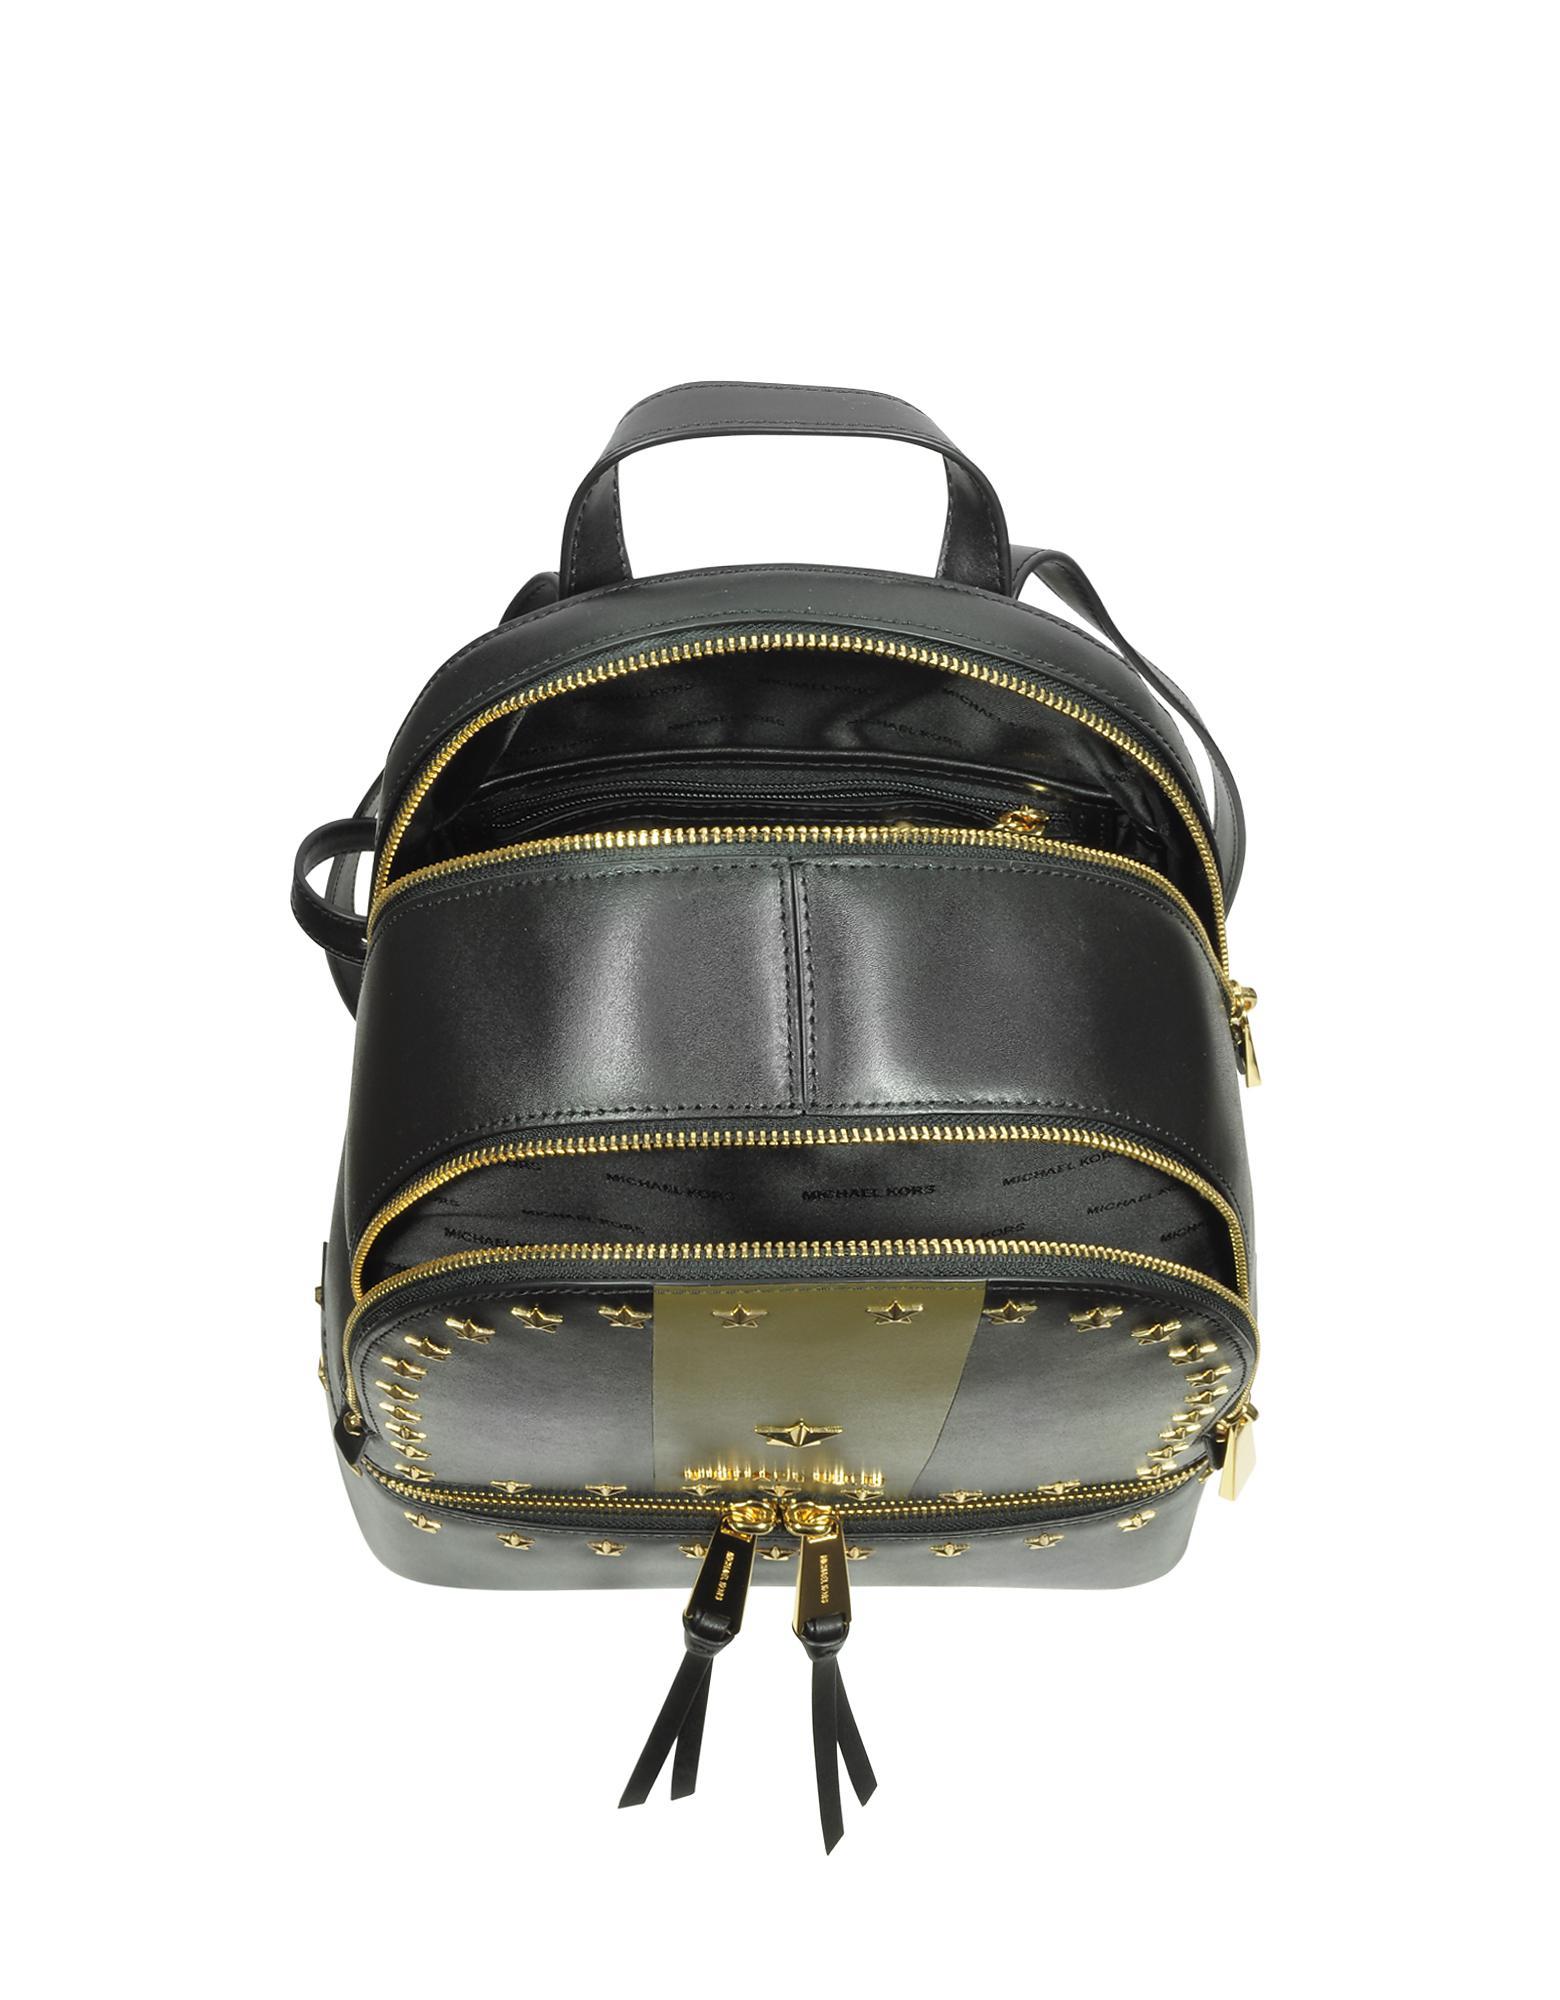 c1bb7204b5aa Lyst - Michael Kors Rhea Zip Medium Black And Olive Leather Backpack ...